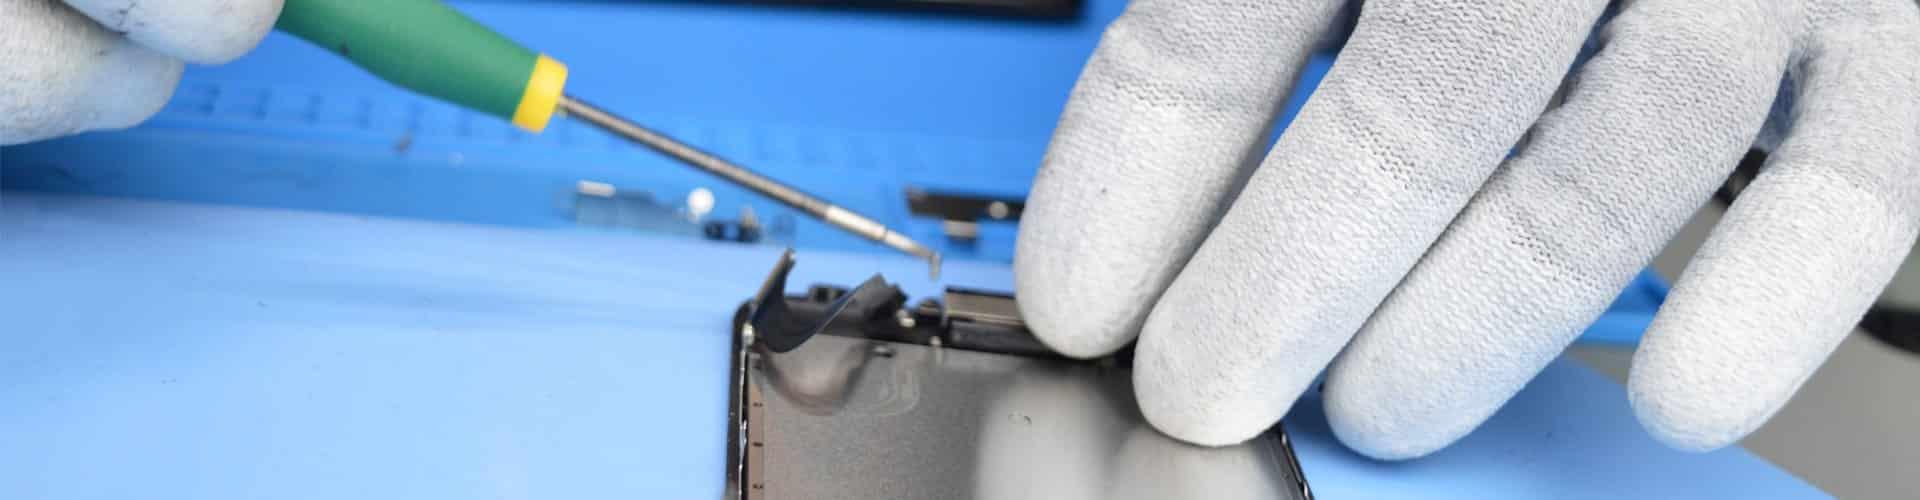 iphone screen repair milton keynes, iphone screen repair northampton, iphone screen repair kettering